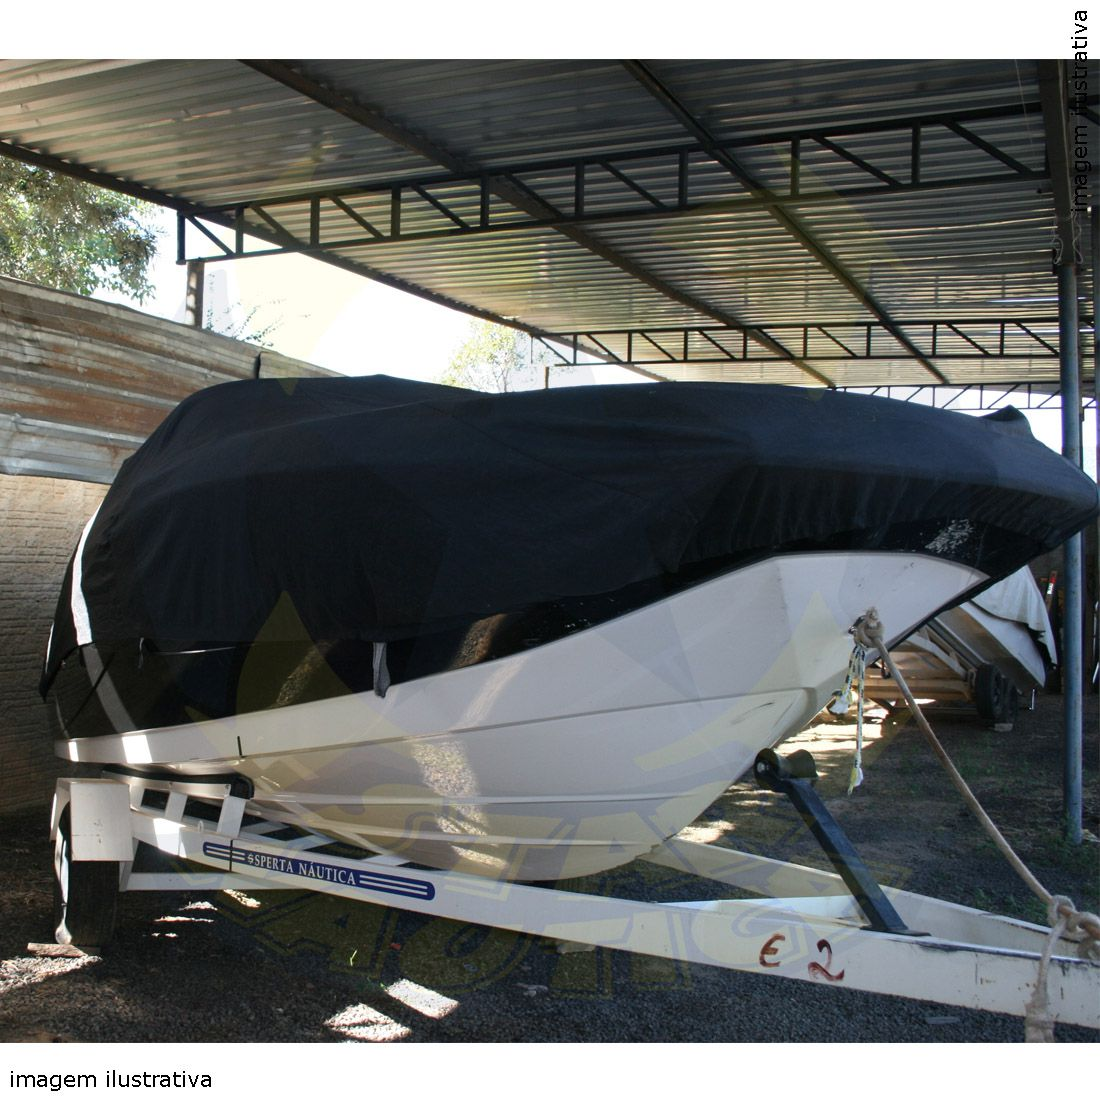 Capa Lona de Cobertura Lancha Focker 200 Lona Vinílica